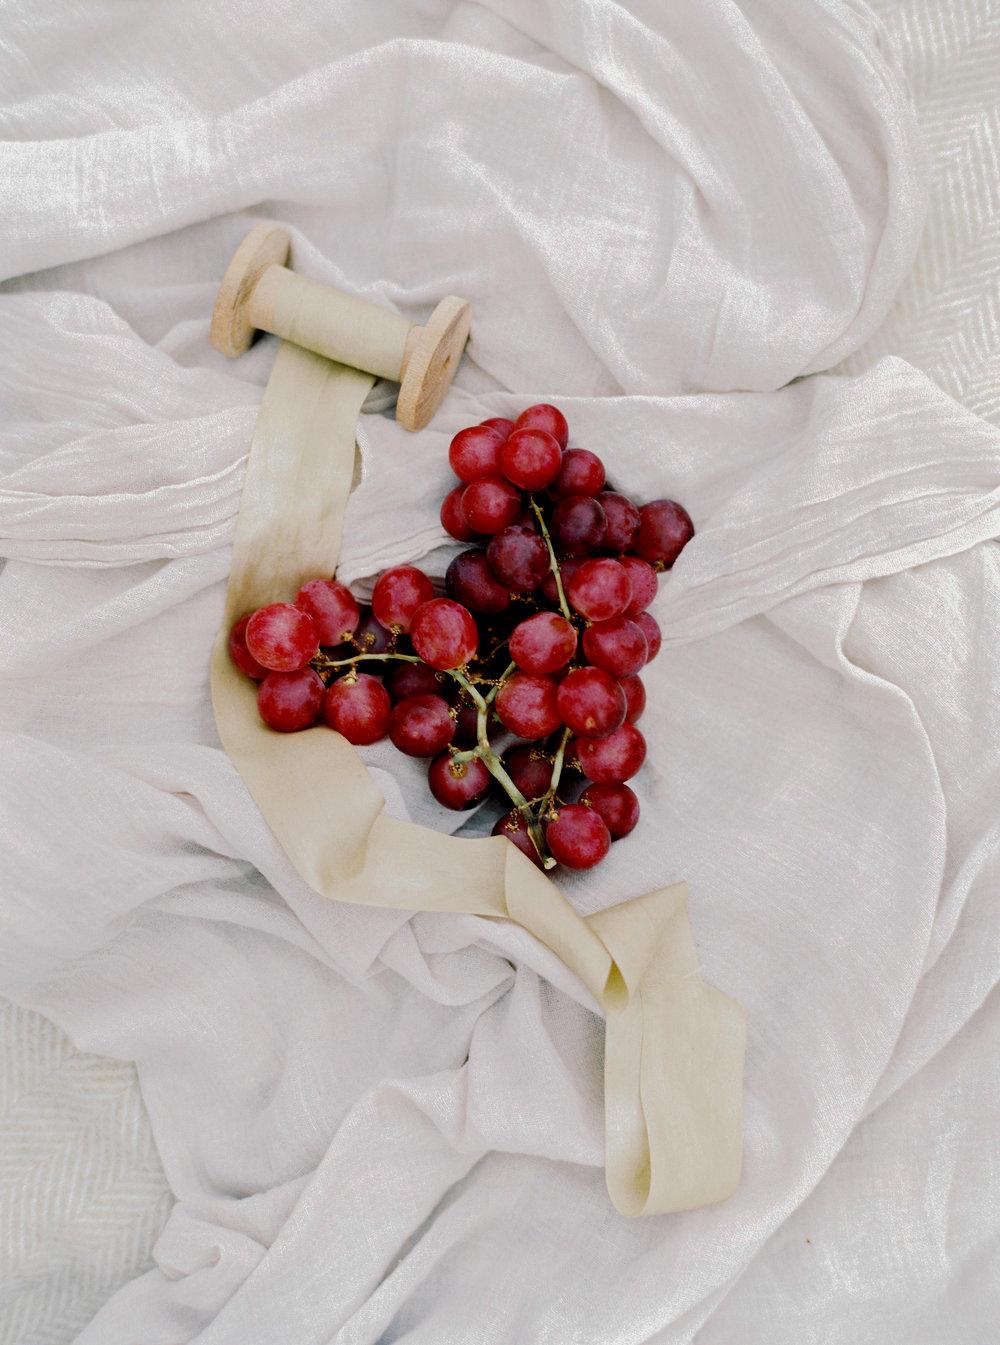 Luxury Wedding Planner UK | Our Chic & Romantic Engagement Shoot in Bath | Katie Julia Photography - 14.JPG